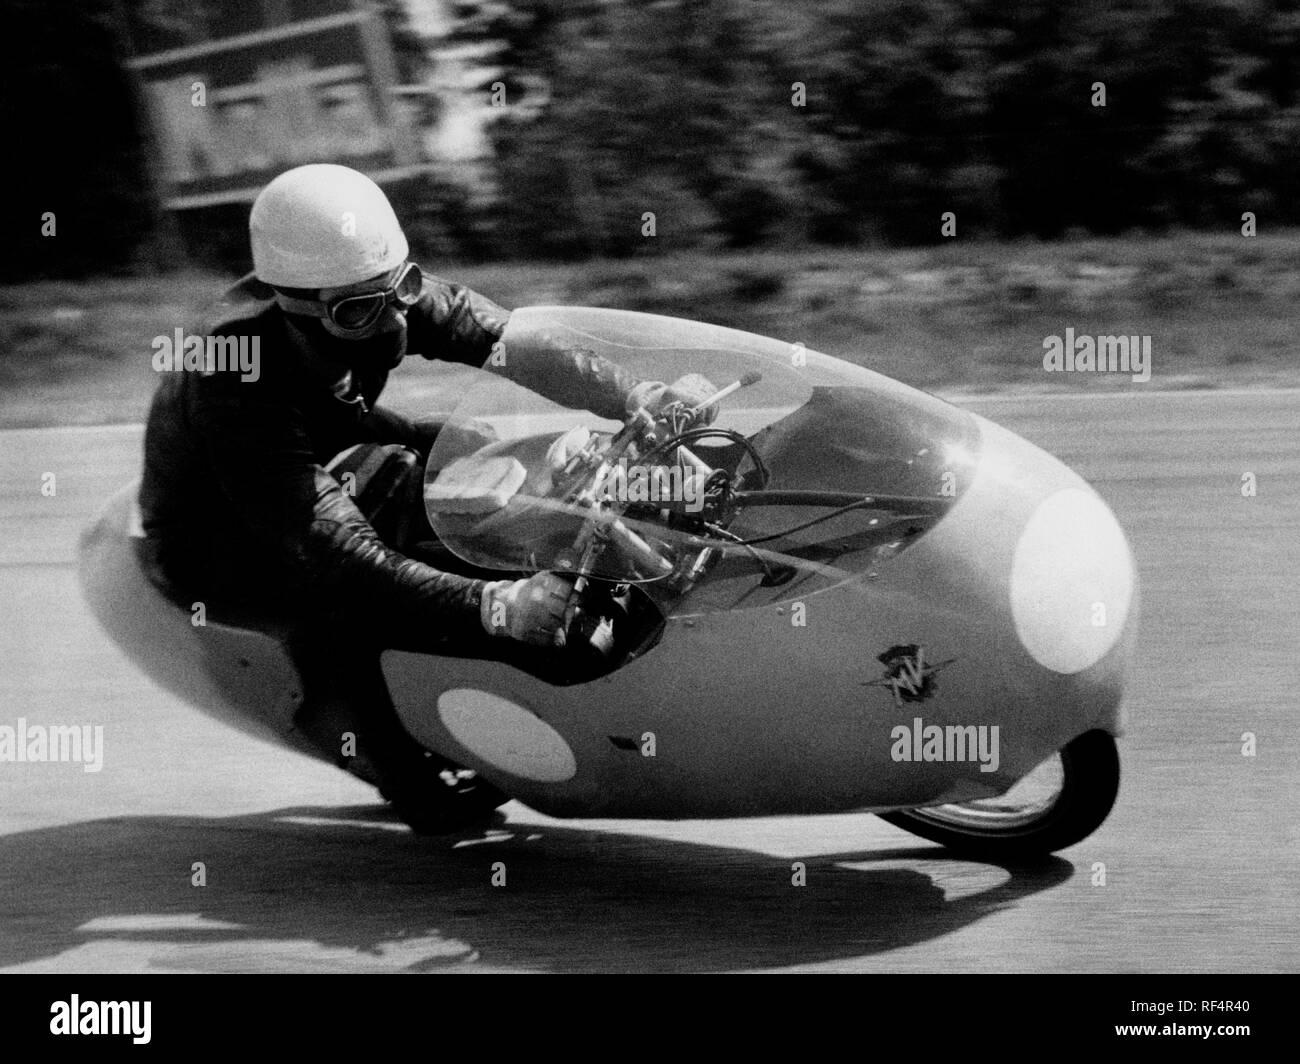 carlo ubbiali, mv agusta 125 cc, 1957 Stock Photo